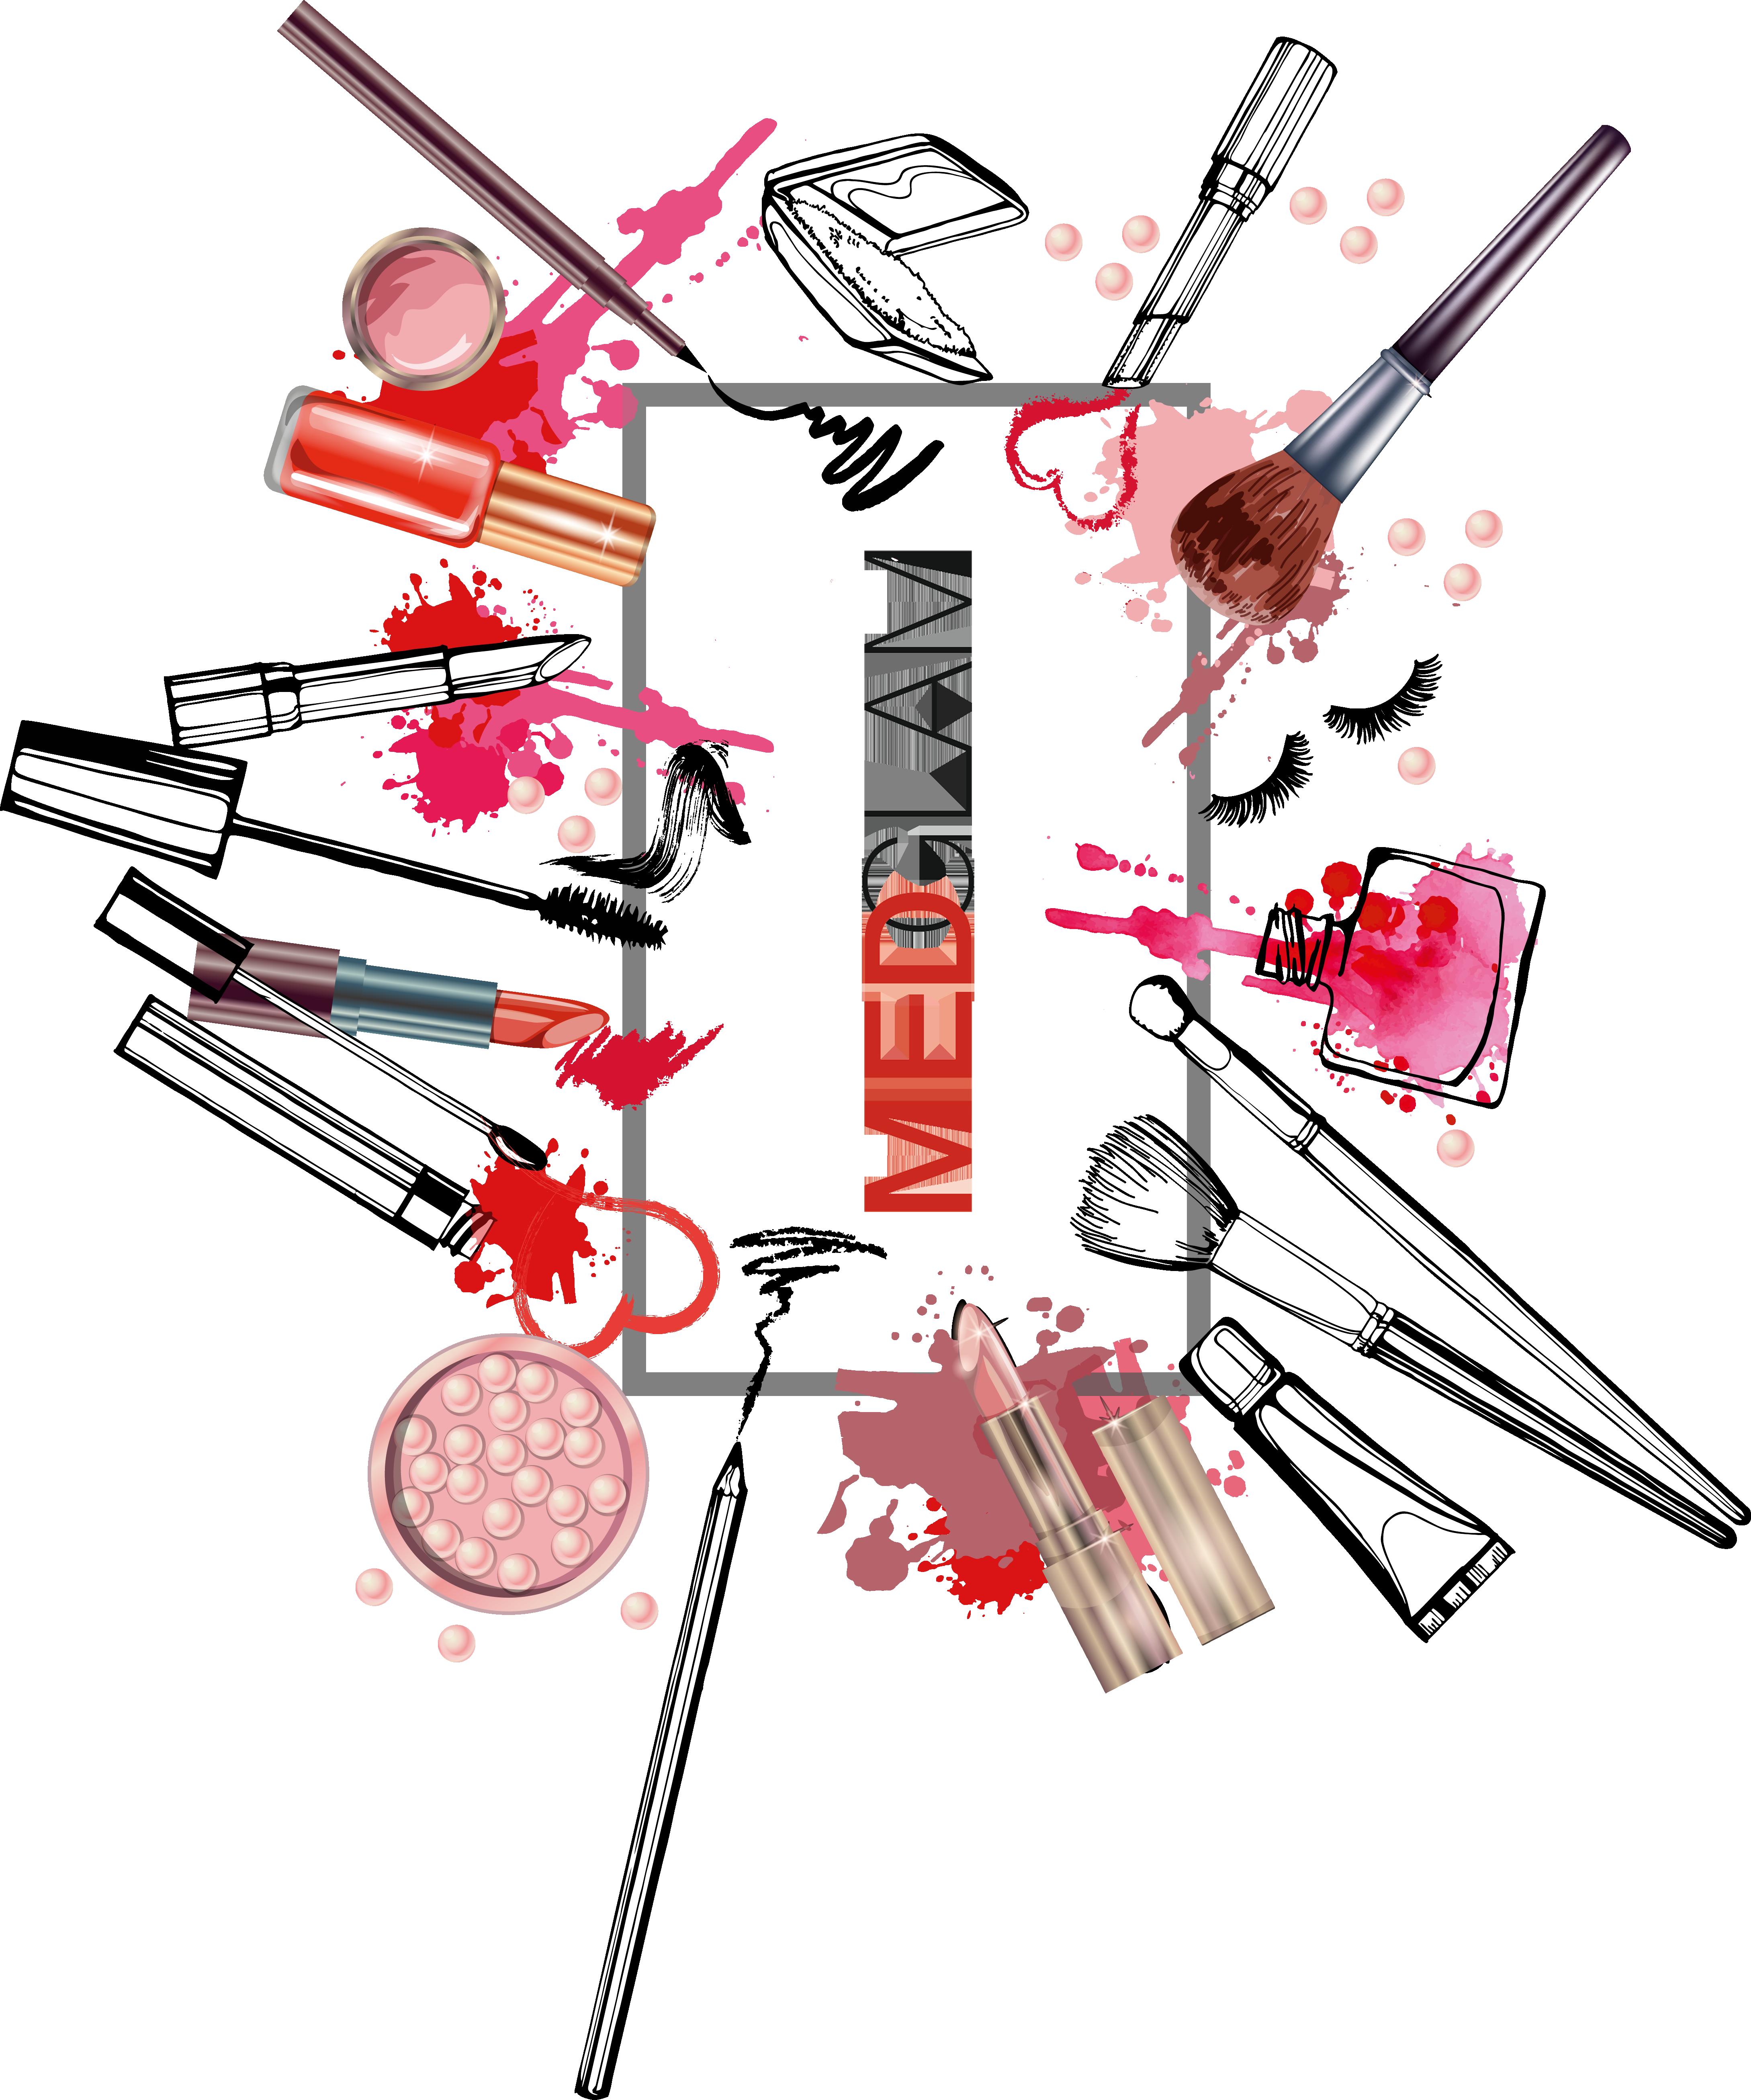 Pin By Medglam On Medglam In 2019 Makeup Artist Logo